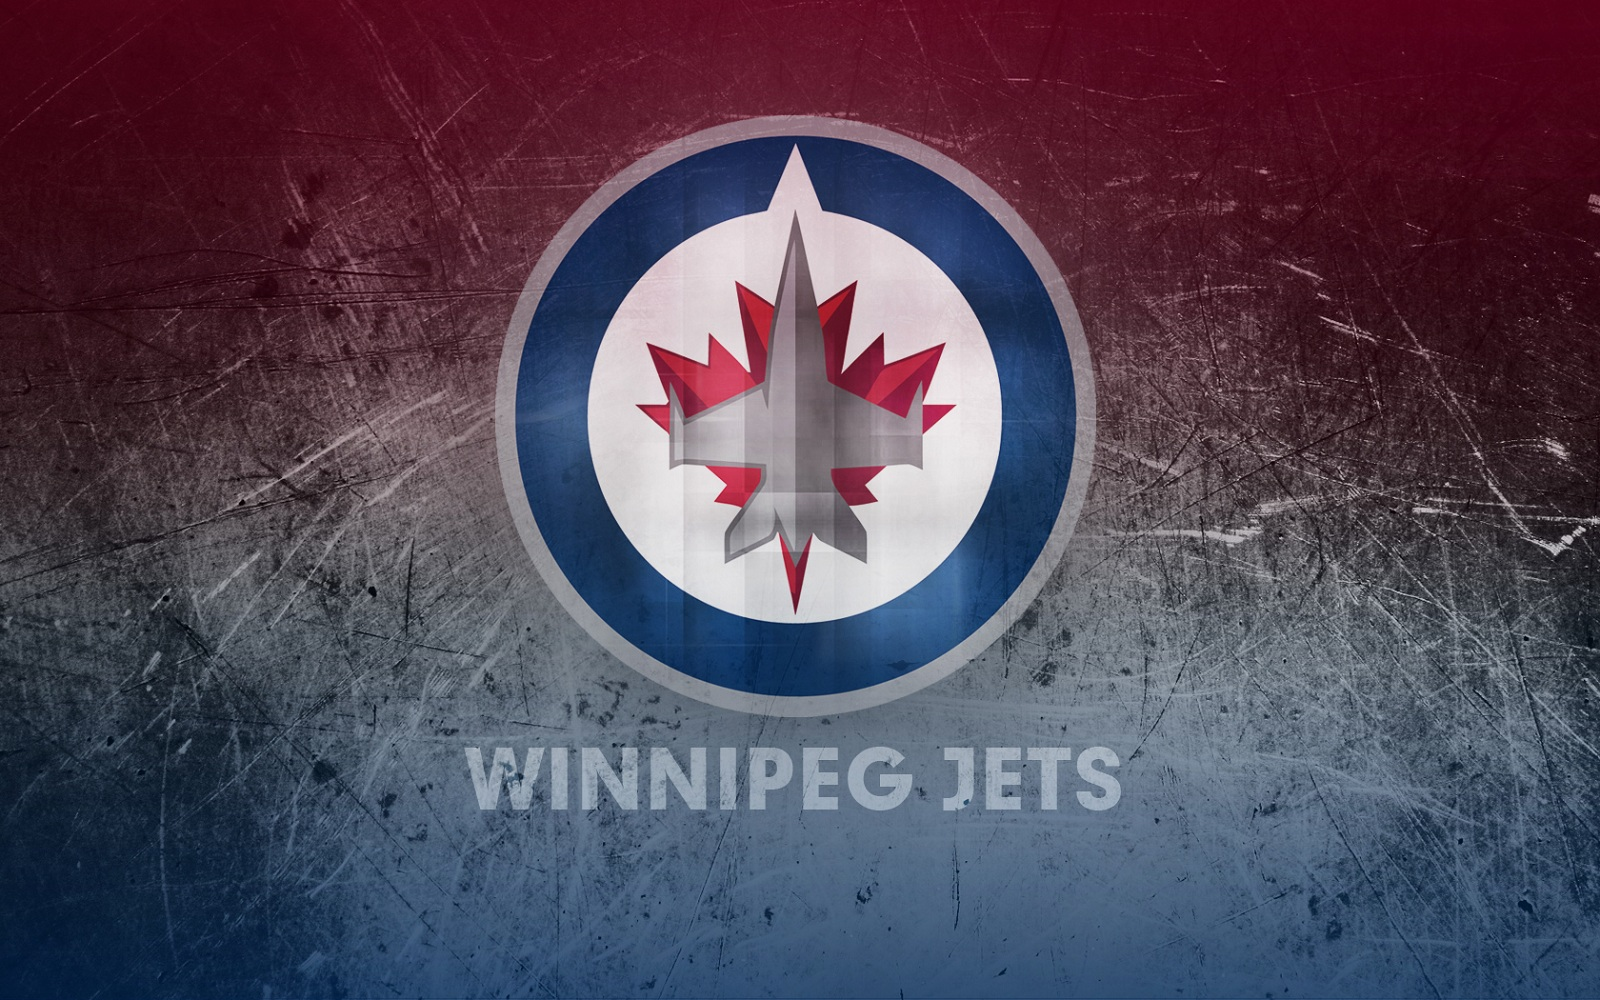 Hockey Winnipeg Jets wallpaper 1600x1000 128805 WallpaperUP 1600x1000